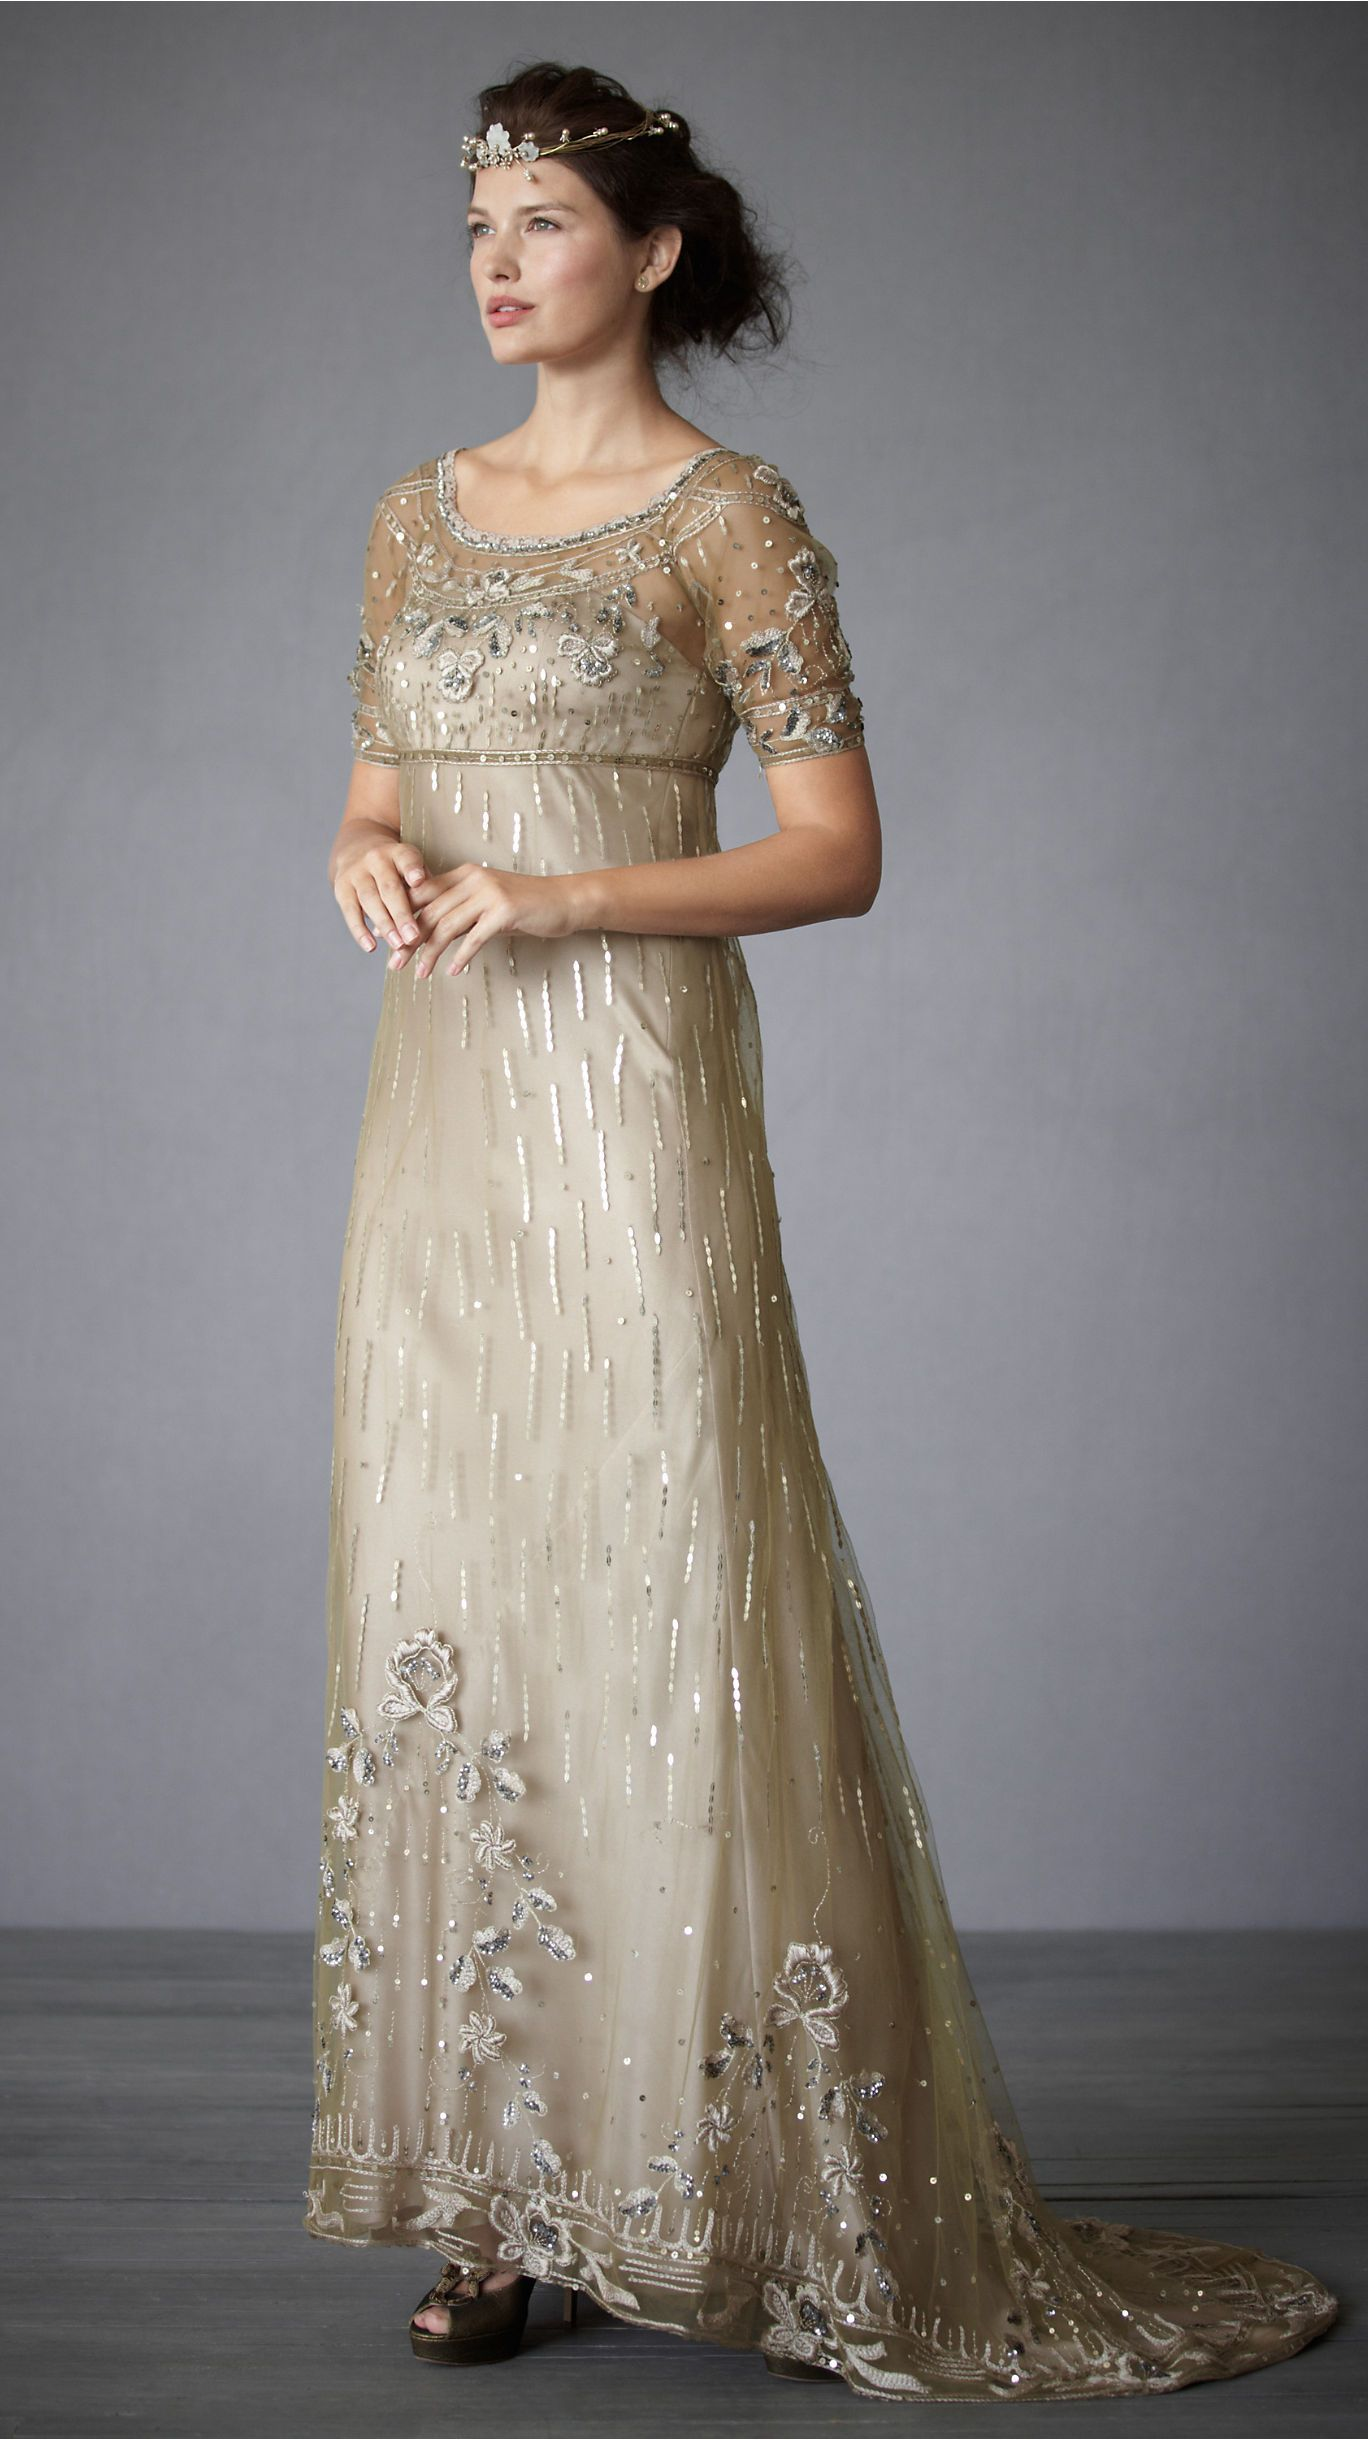 Belles wedding dress  Pin by Anna Belkina on Wedding Belles  Pinterest  Belle and Wedding